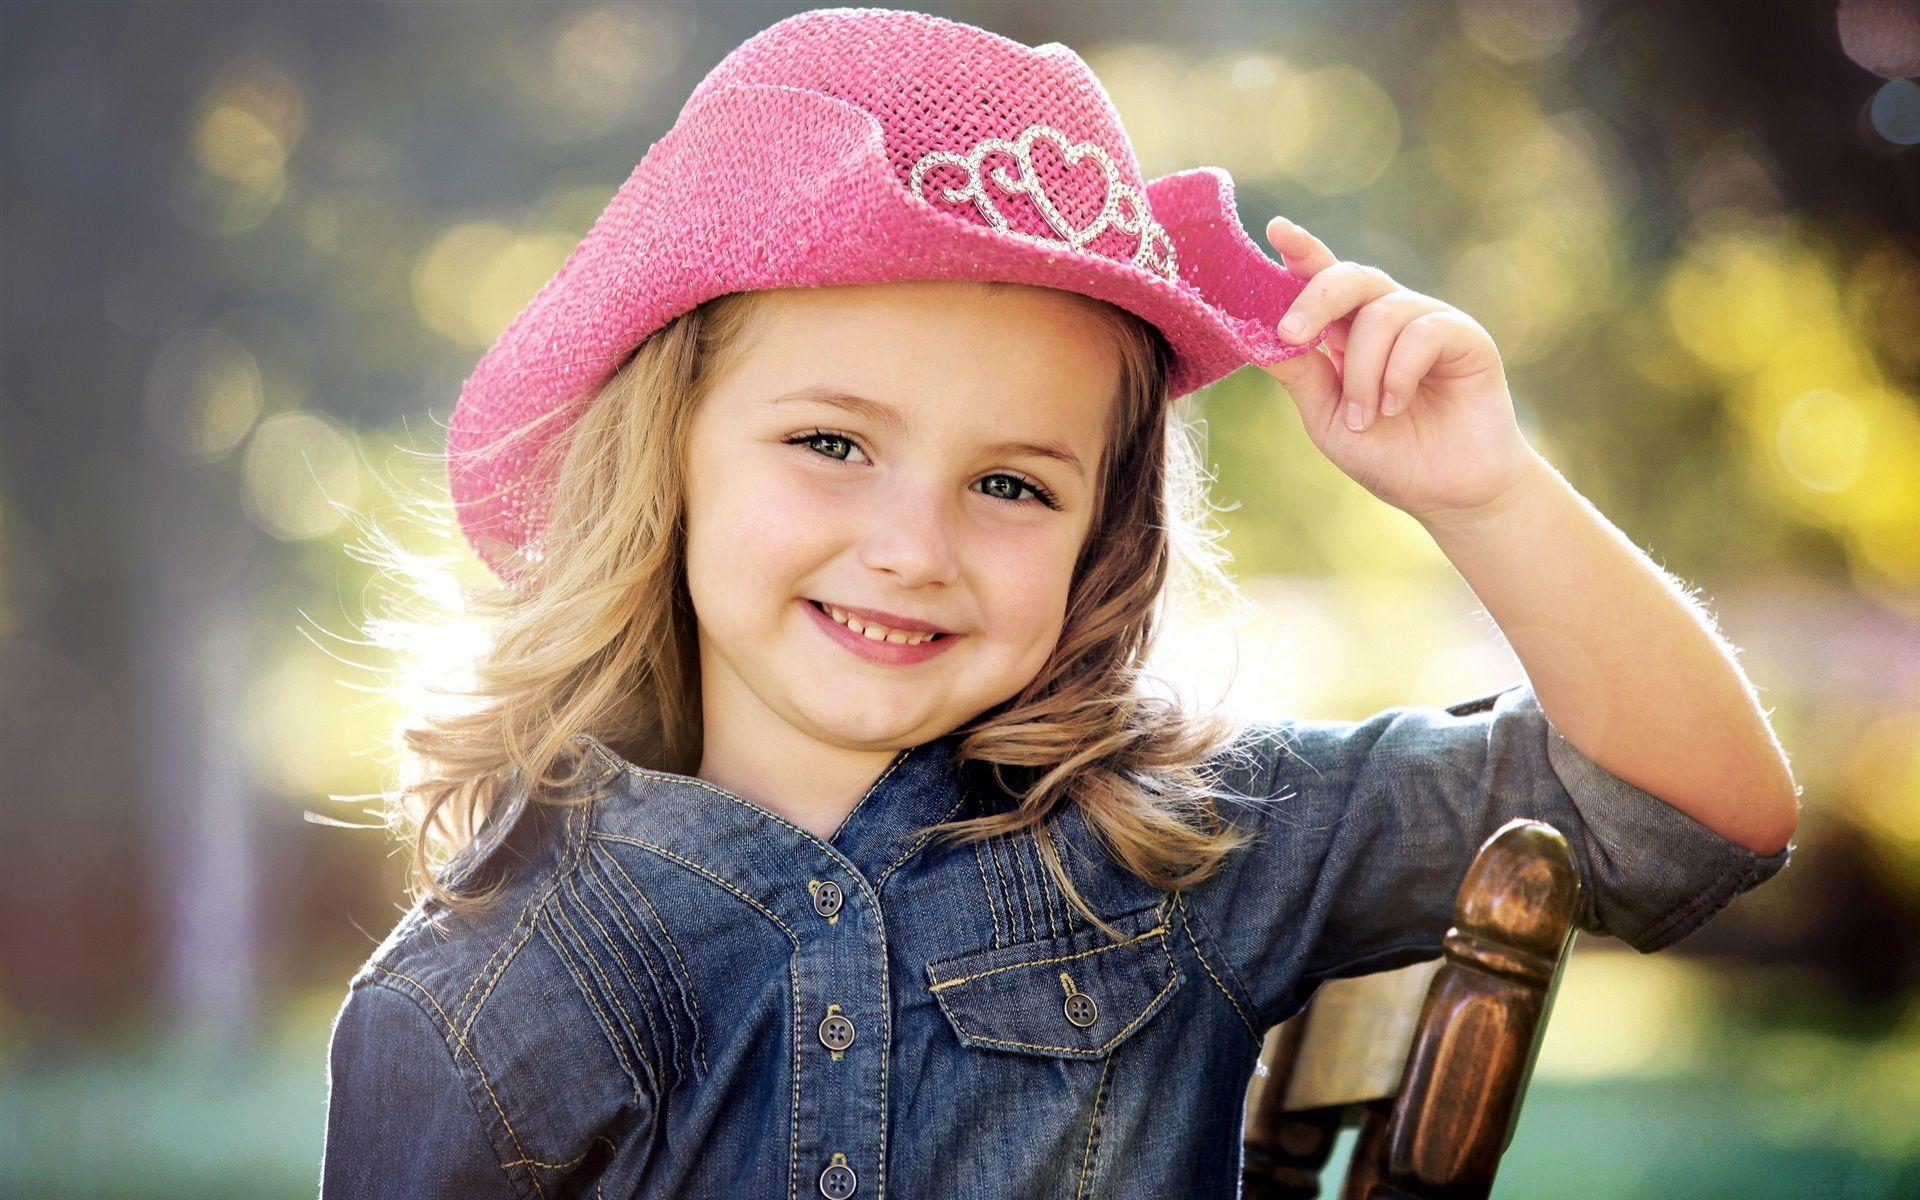 Hd Wallpaper Mood The Girl Mood Smiling Hat 2560x1600 Cute Baby Girl Pictures Baby Girl Wallpaper Cute Baby Girl Wallpaper